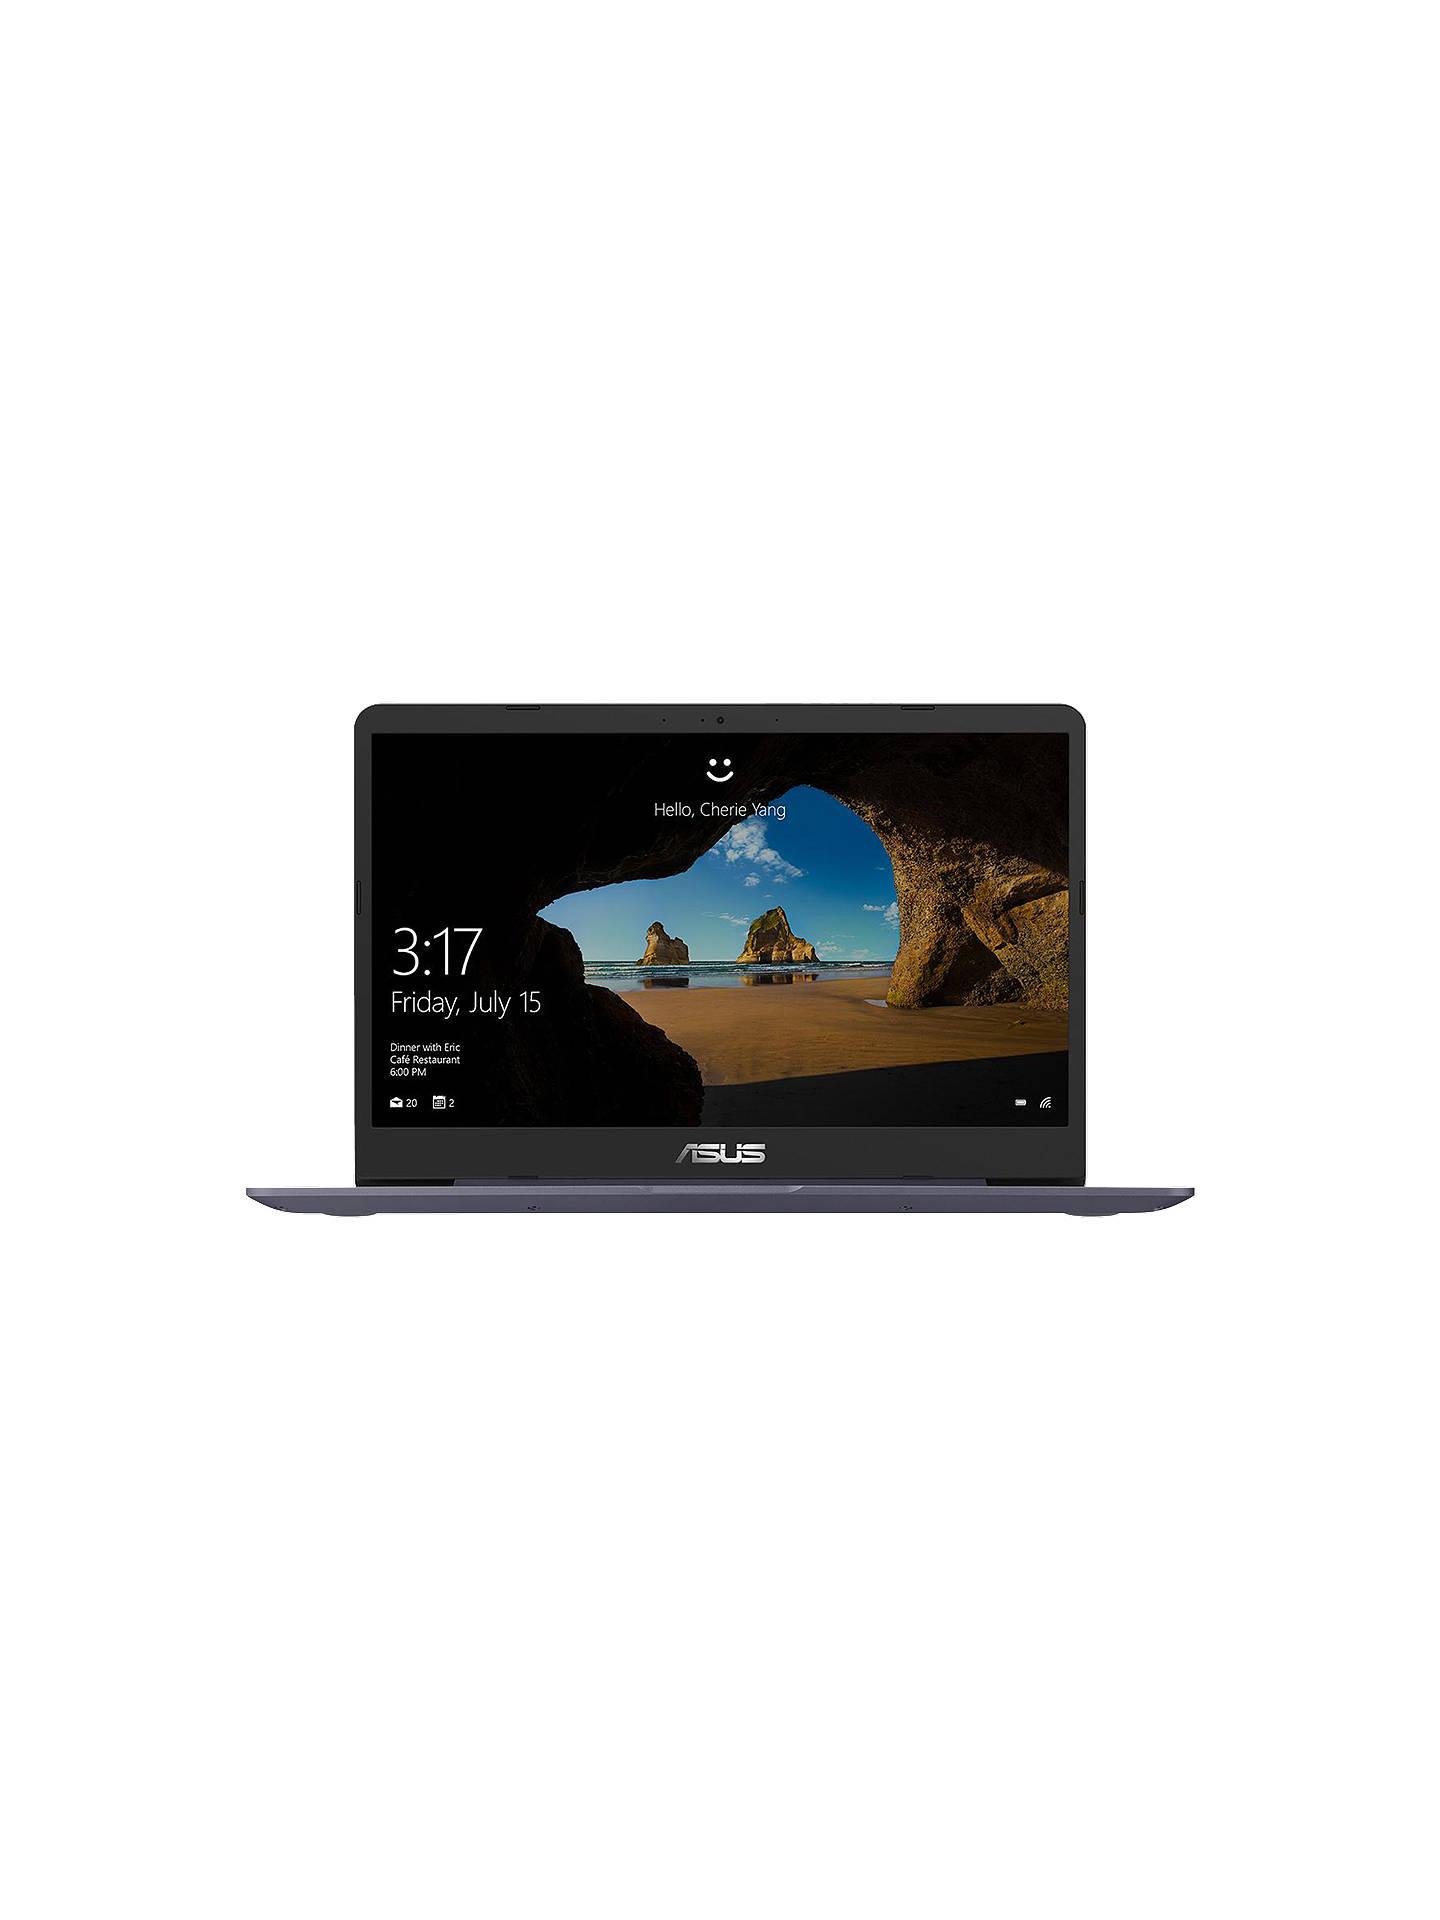 "ASUS VivoBook S14 S406UA-BM216T Laptop, Intel Core i5, 4GB RAM, 256GB SSD,  14 1"", Full HD, Grey"